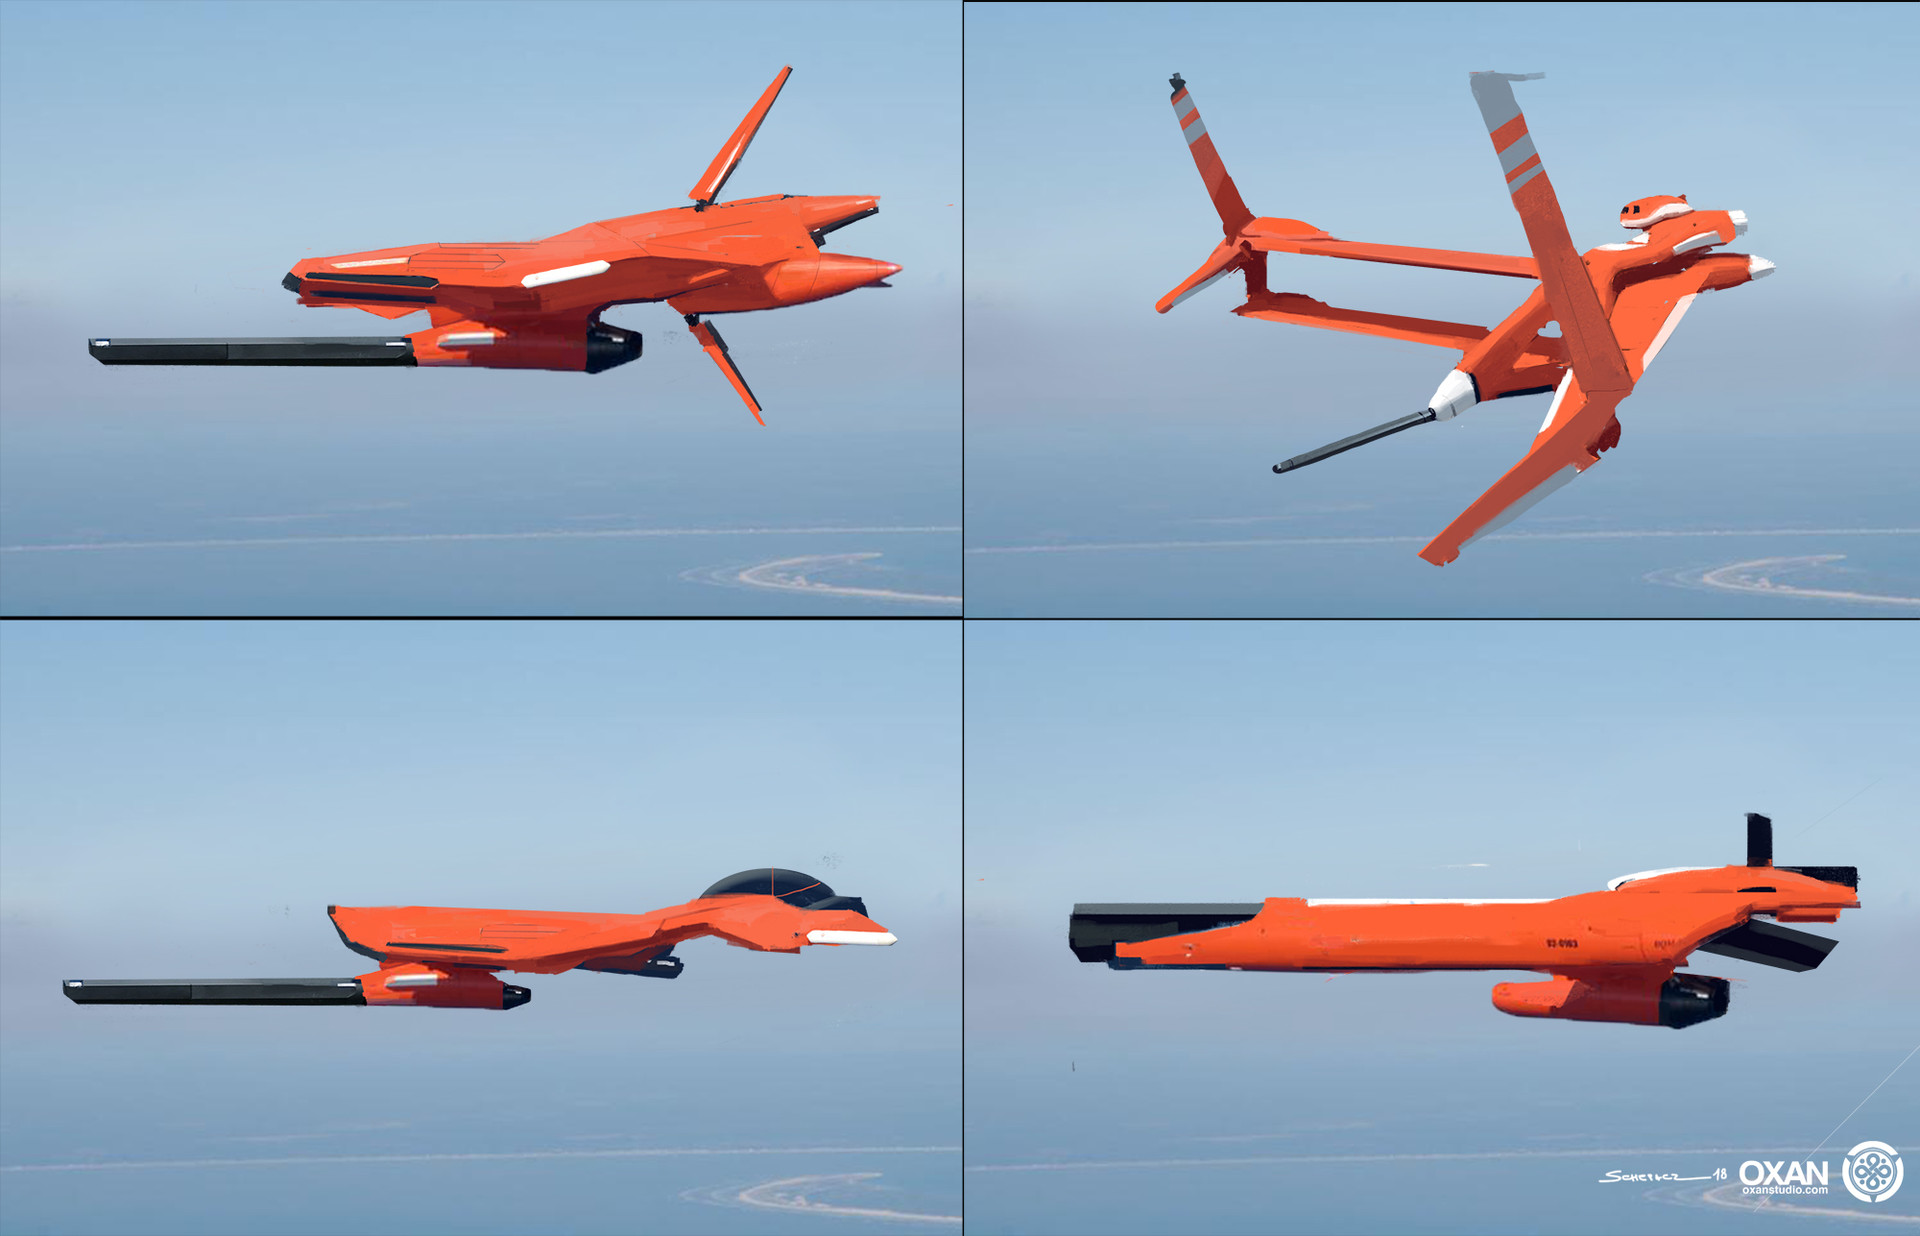 Yohann schepacz swordfish drones